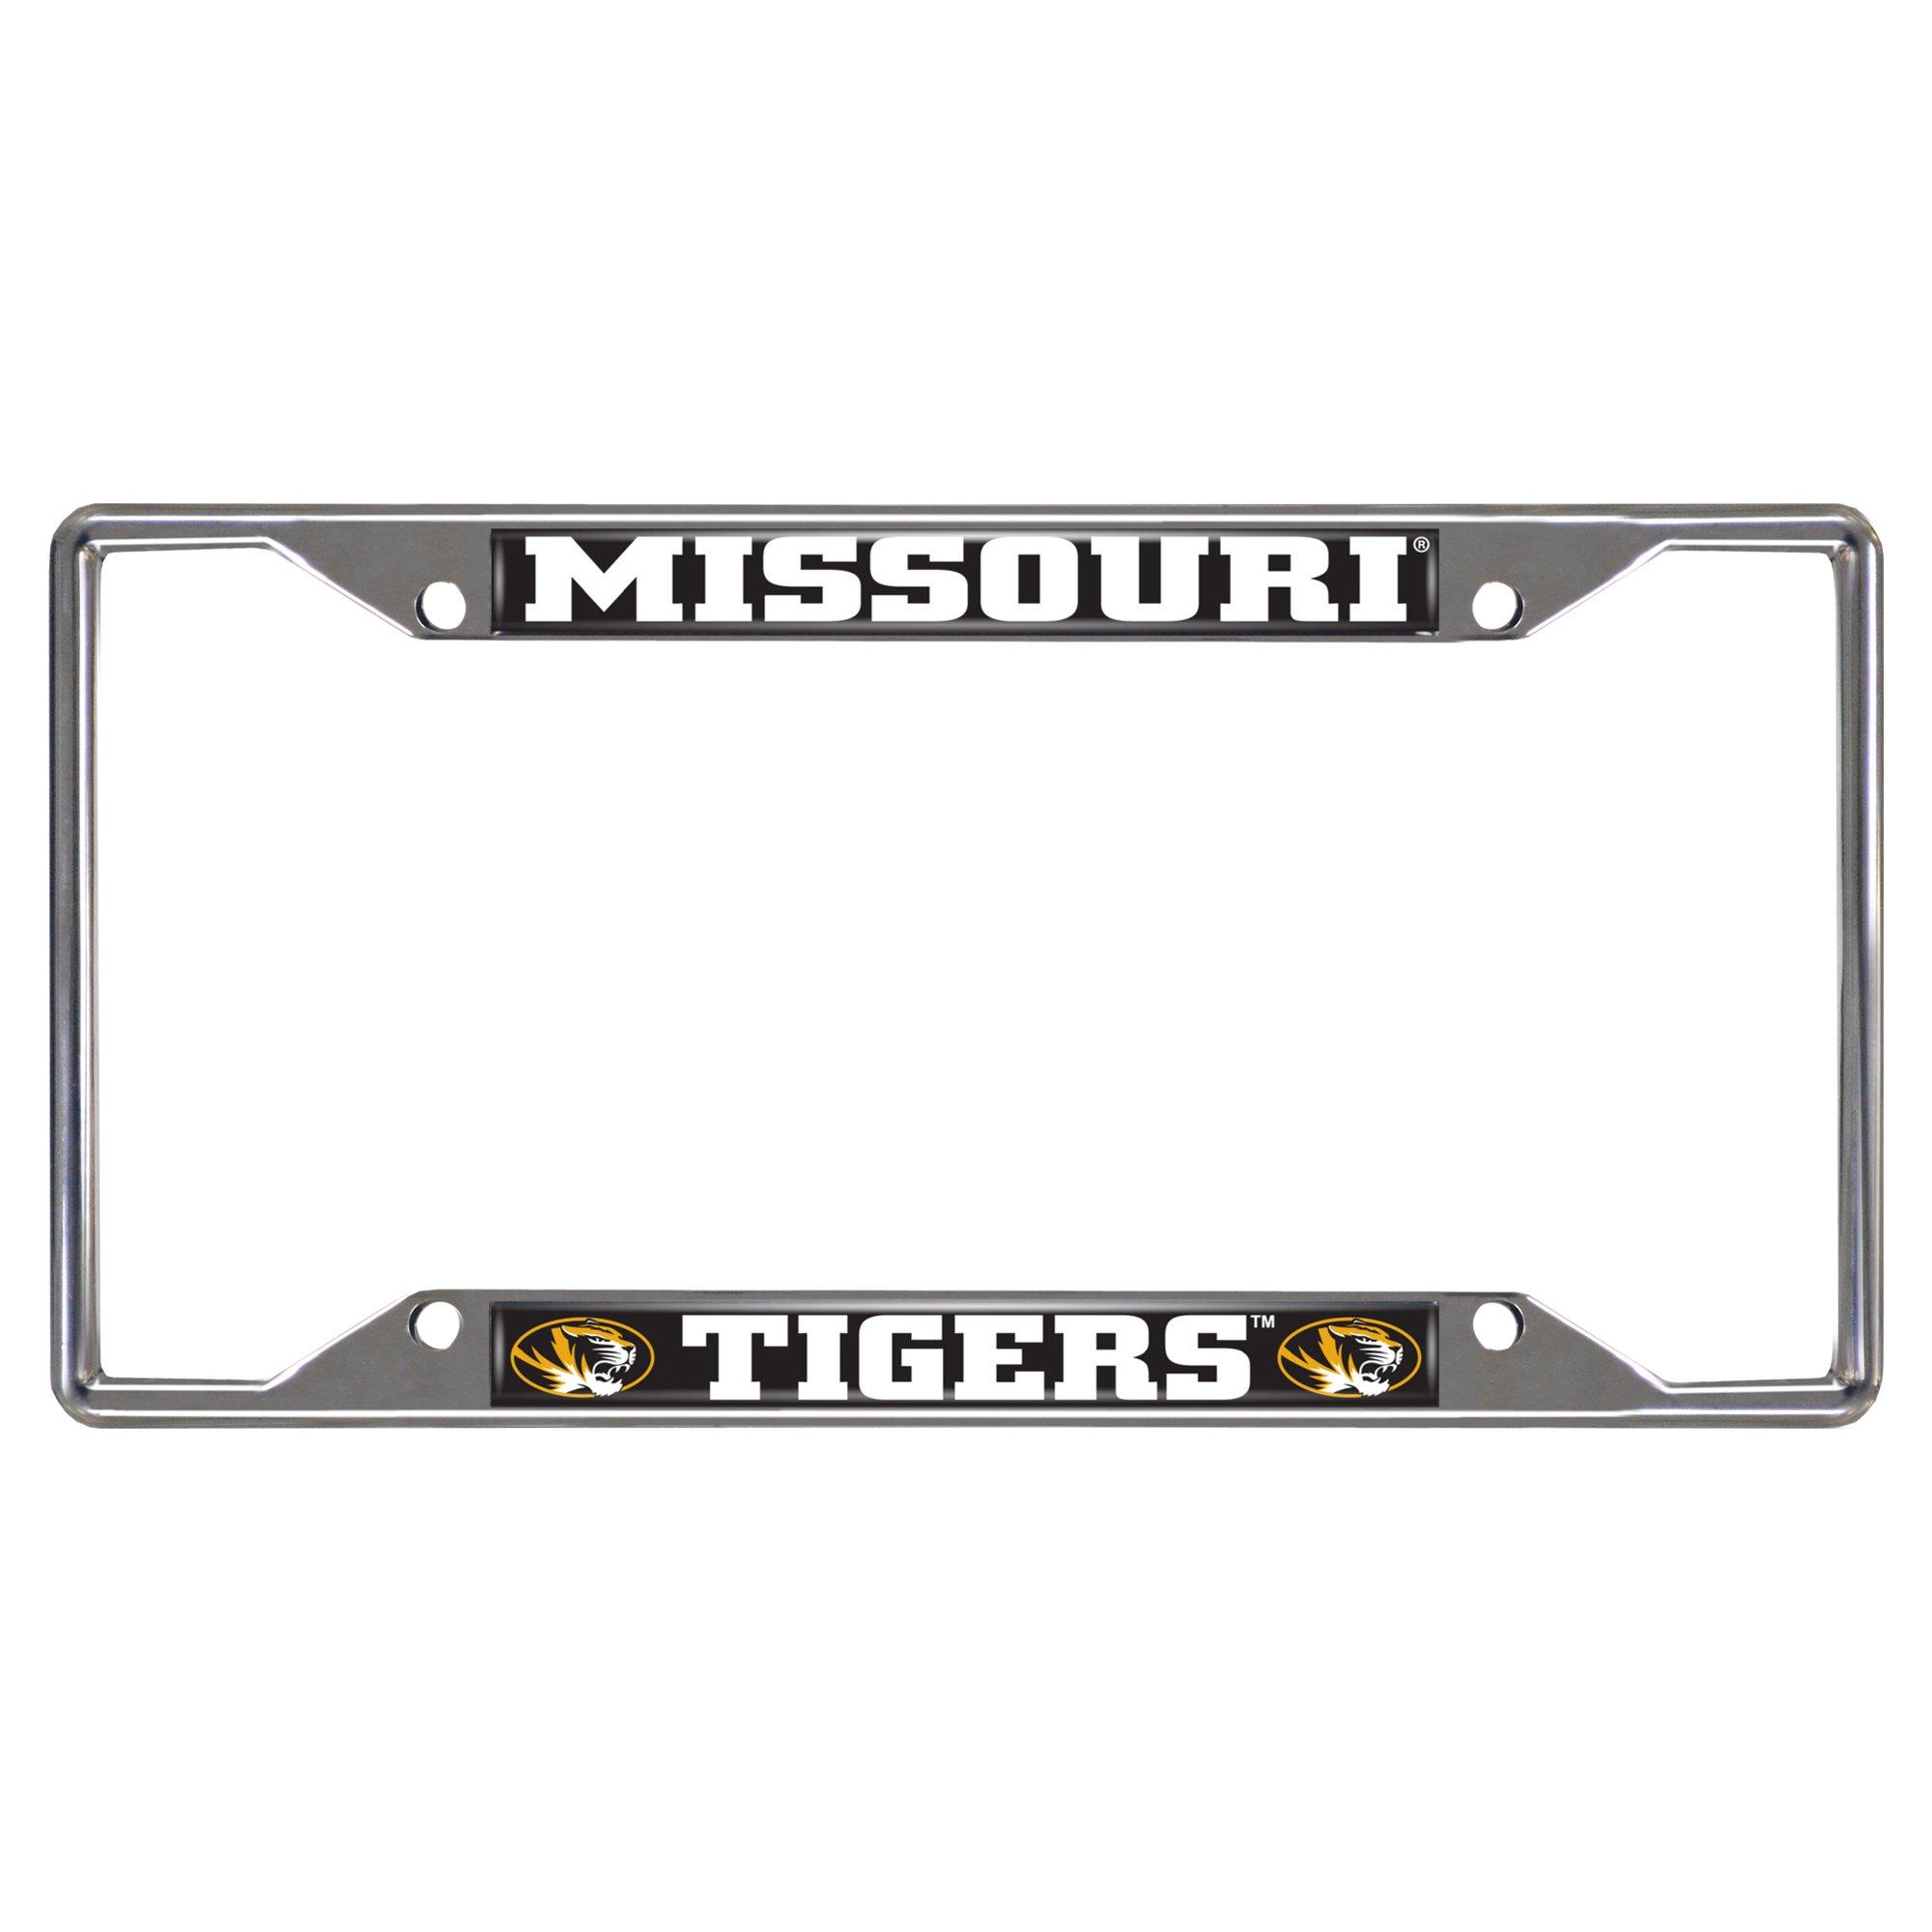 FANMATS NCAA University of Missouri Tigers Chrome License Plate Frame